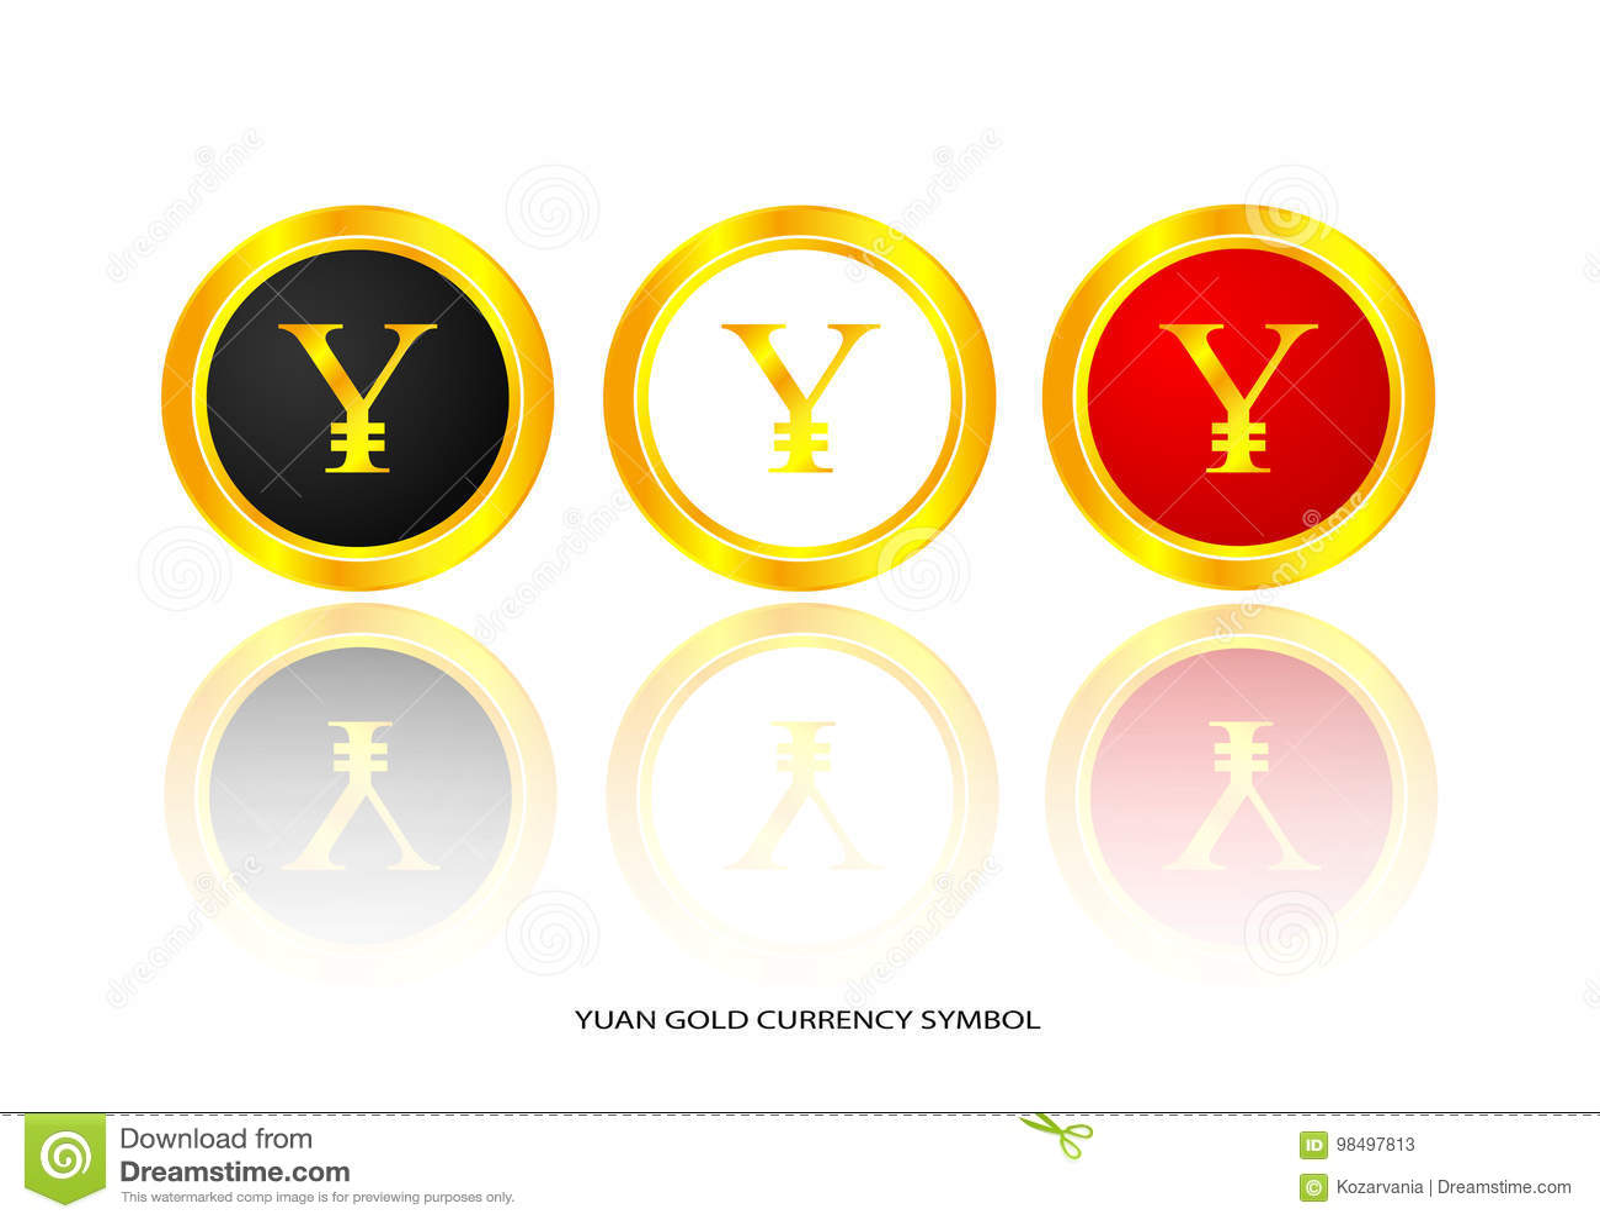 Yuan gold symbol stock vector illustration of china 98497813 yuan gold symbol biocorpaavc Image collections